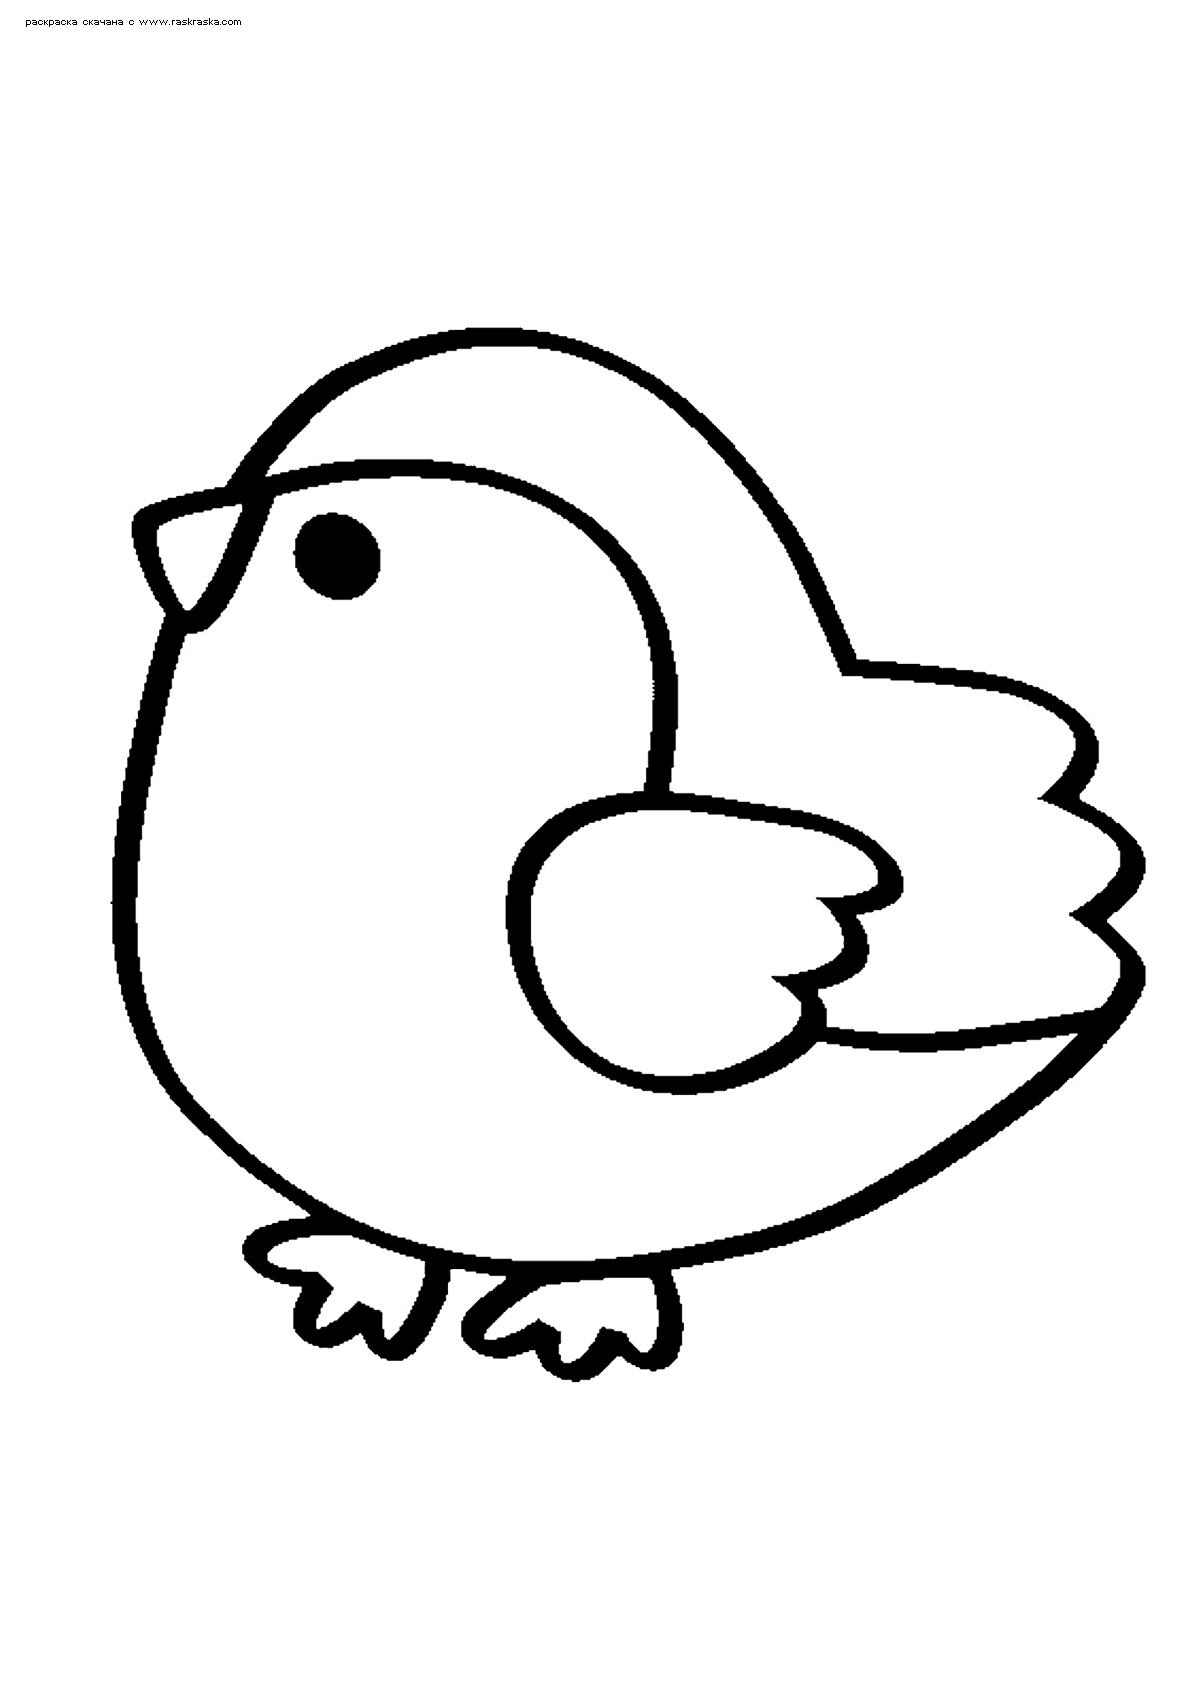 Раскраска Птичка. Раскраска воробей, птица